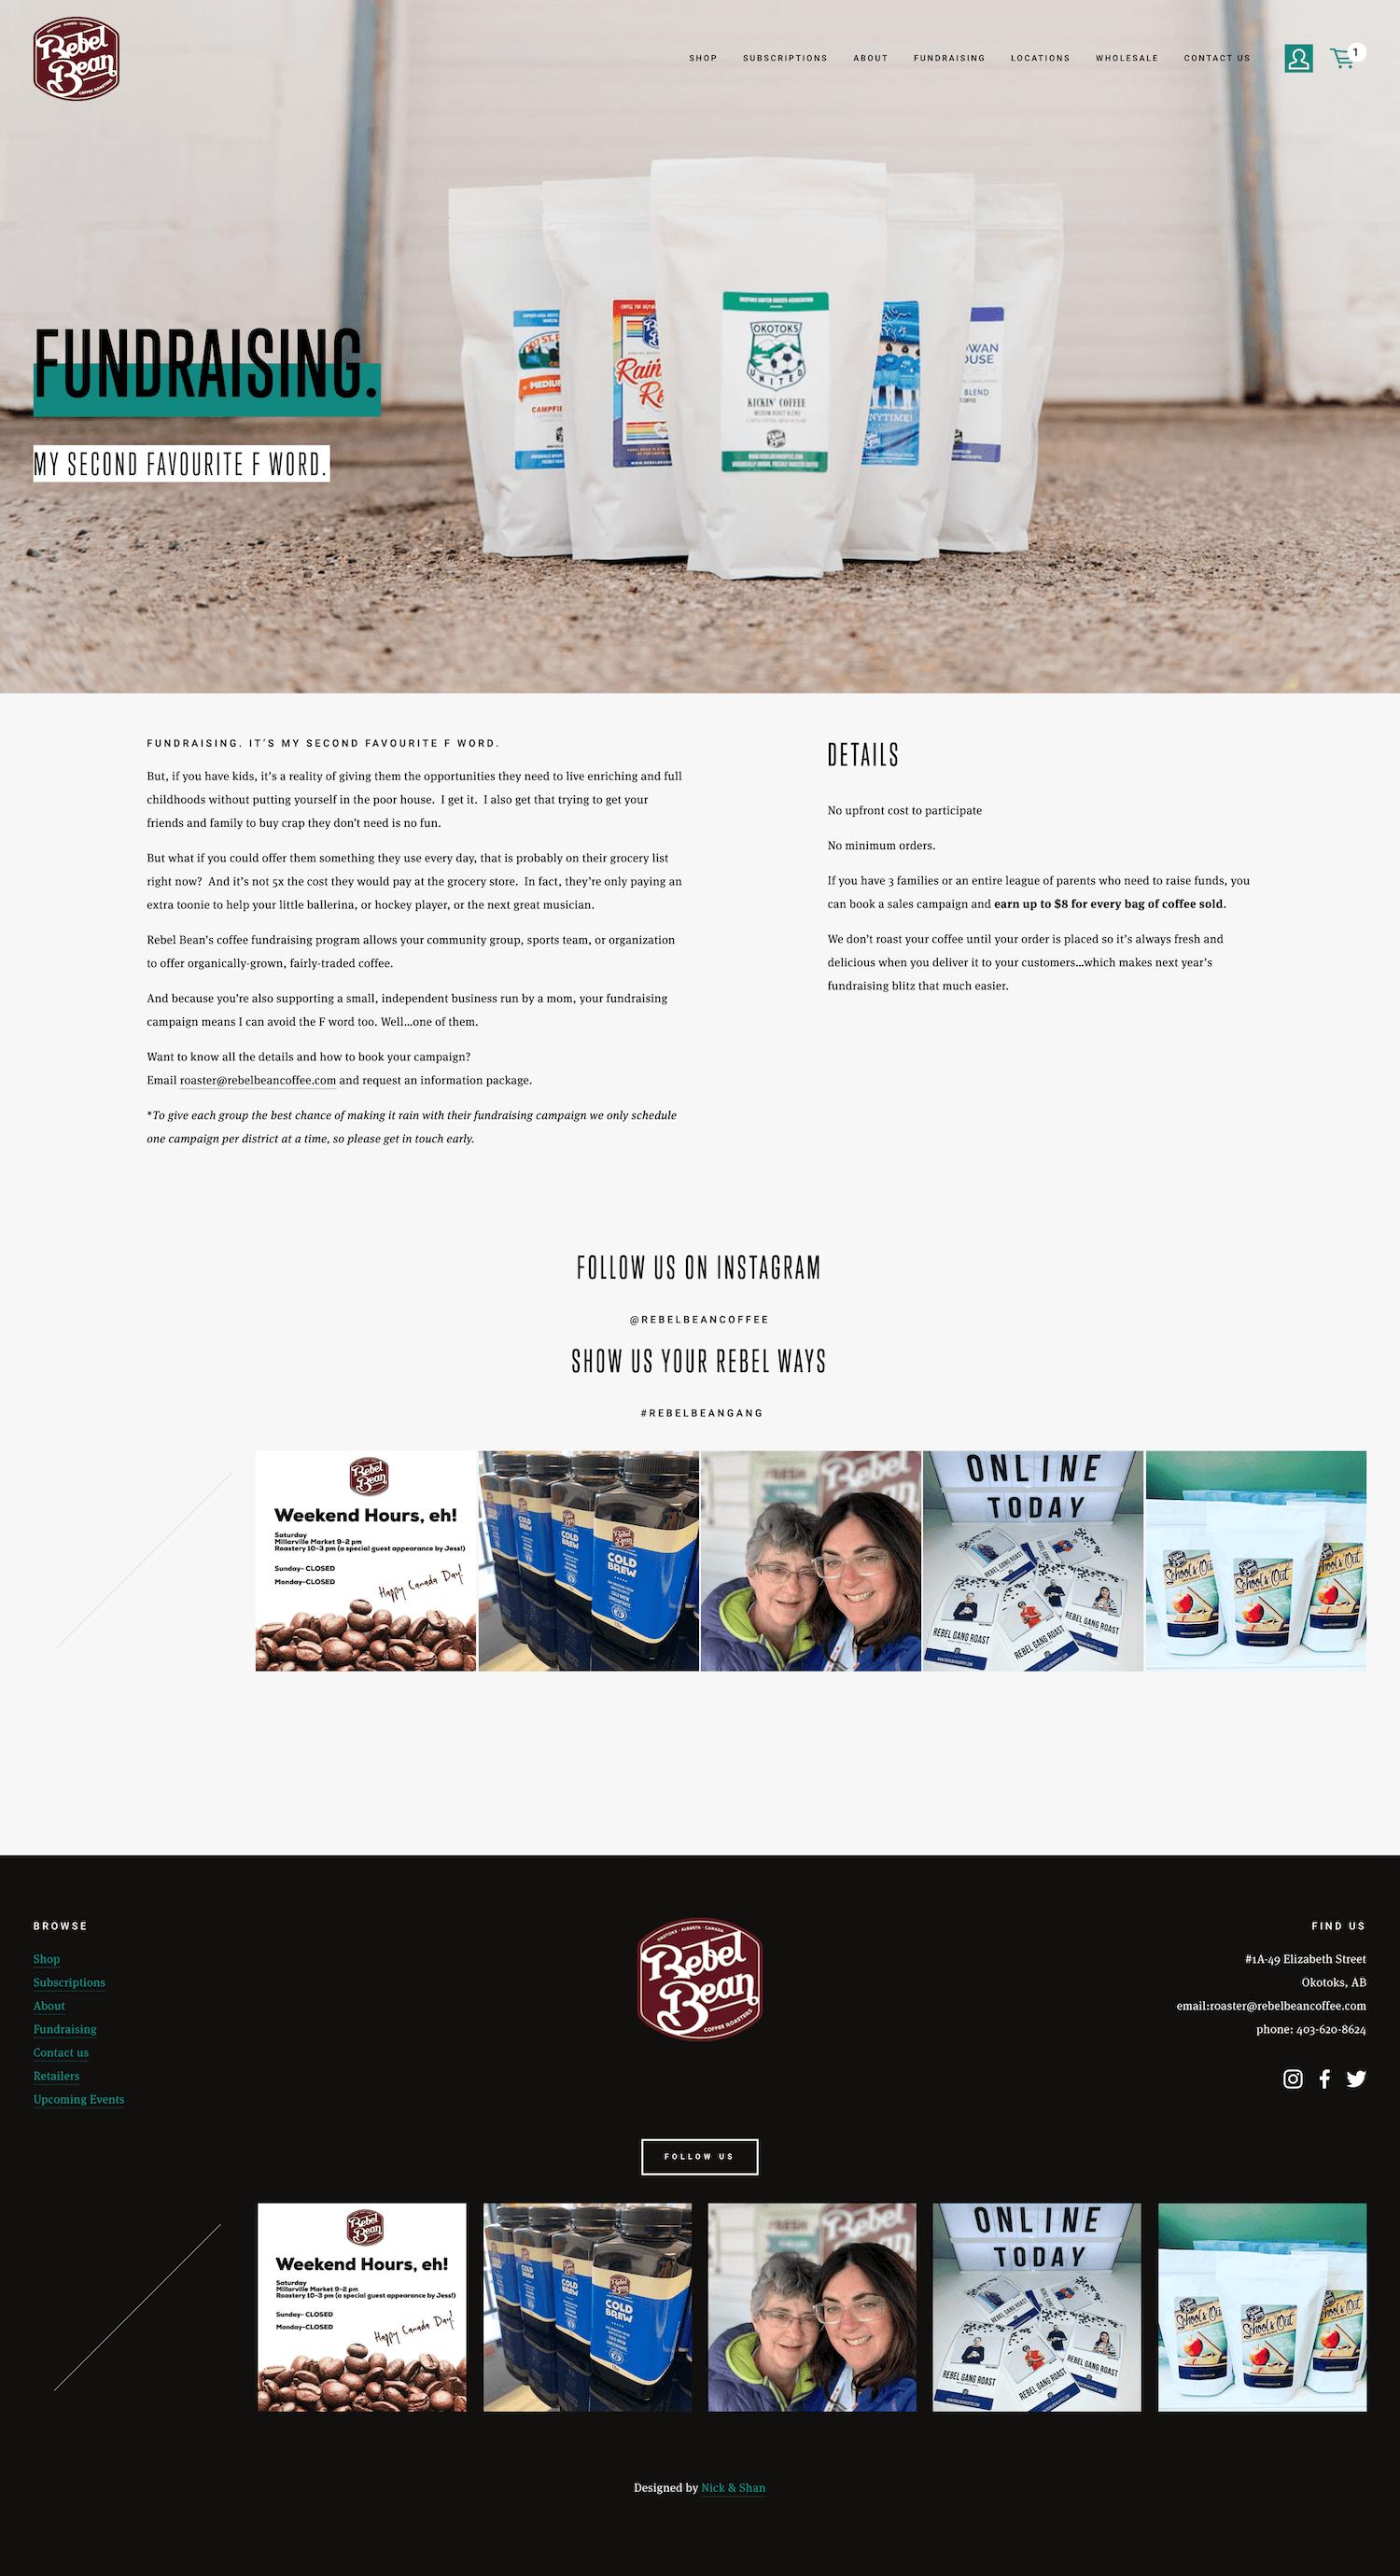 Fundraising-okotoks-coffee